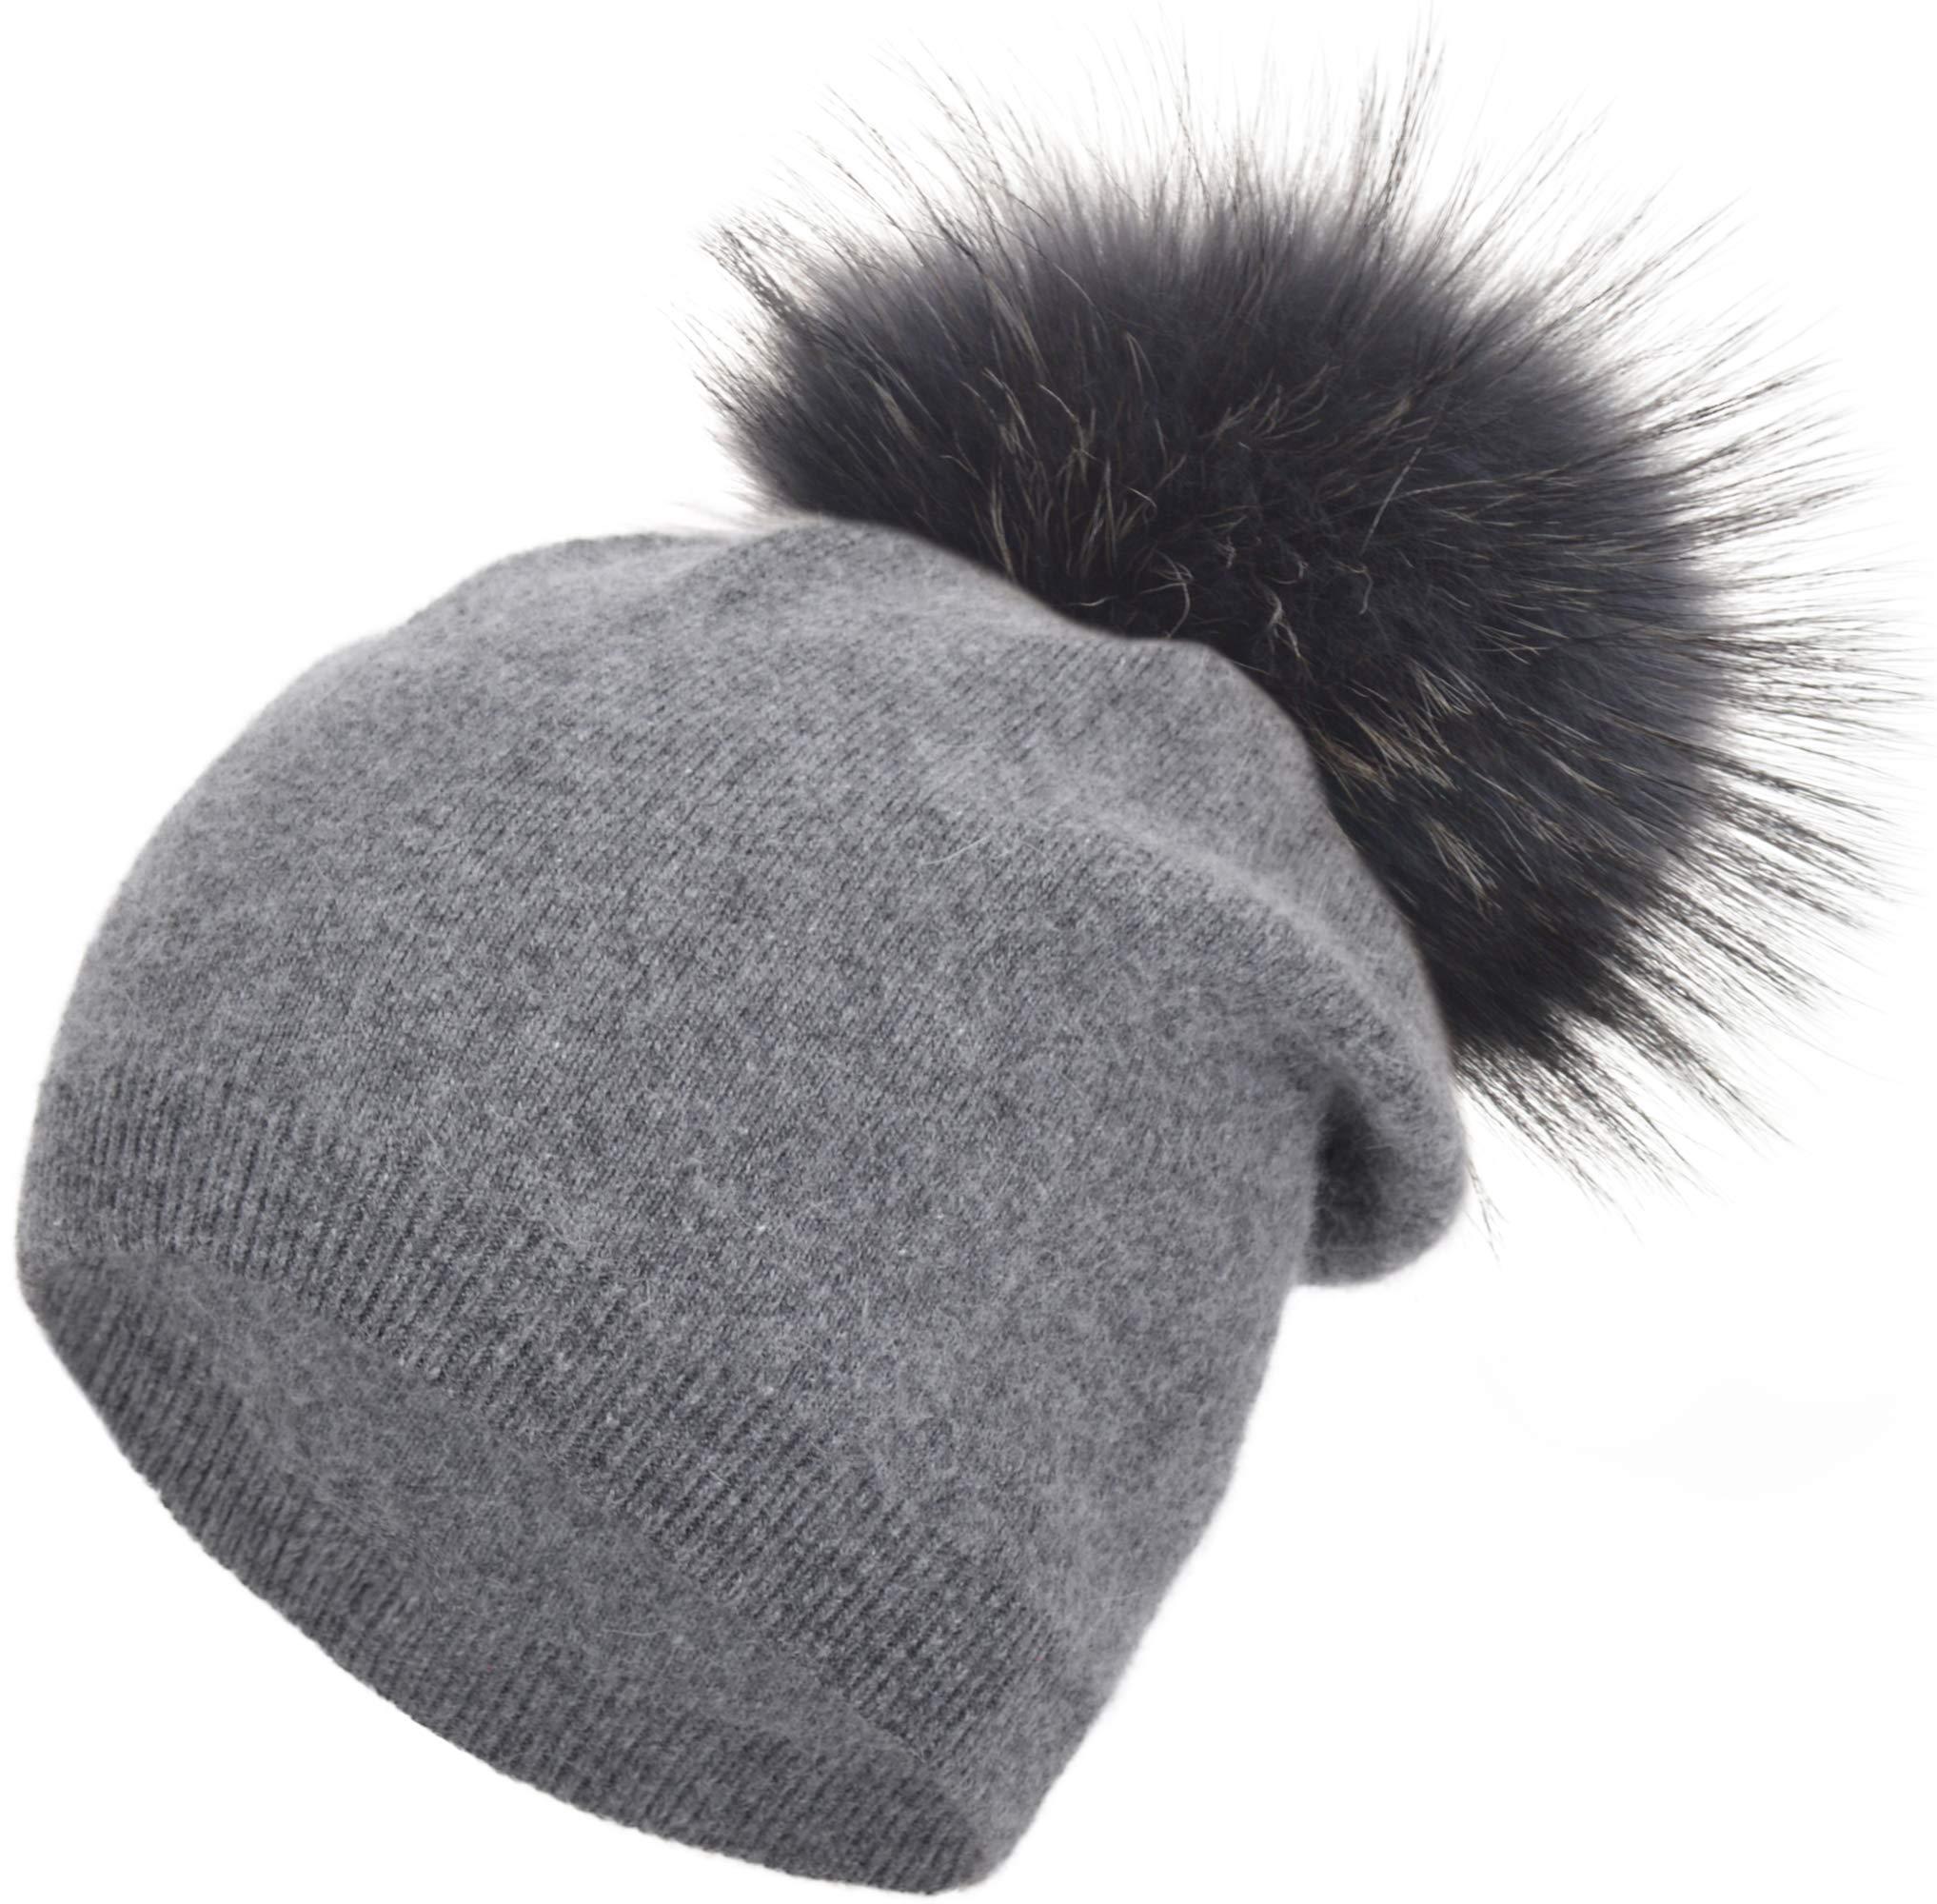 Womens Ladies Darkgrey Cashmere Slouchy Beanie Winter Warm Hat for Women Winter Real Raccoon Fur Pom Pom Winter Hat Cashmere Wool Knit Beanie Ski Skull Cap Hat for Women (Darkgrey Pom)